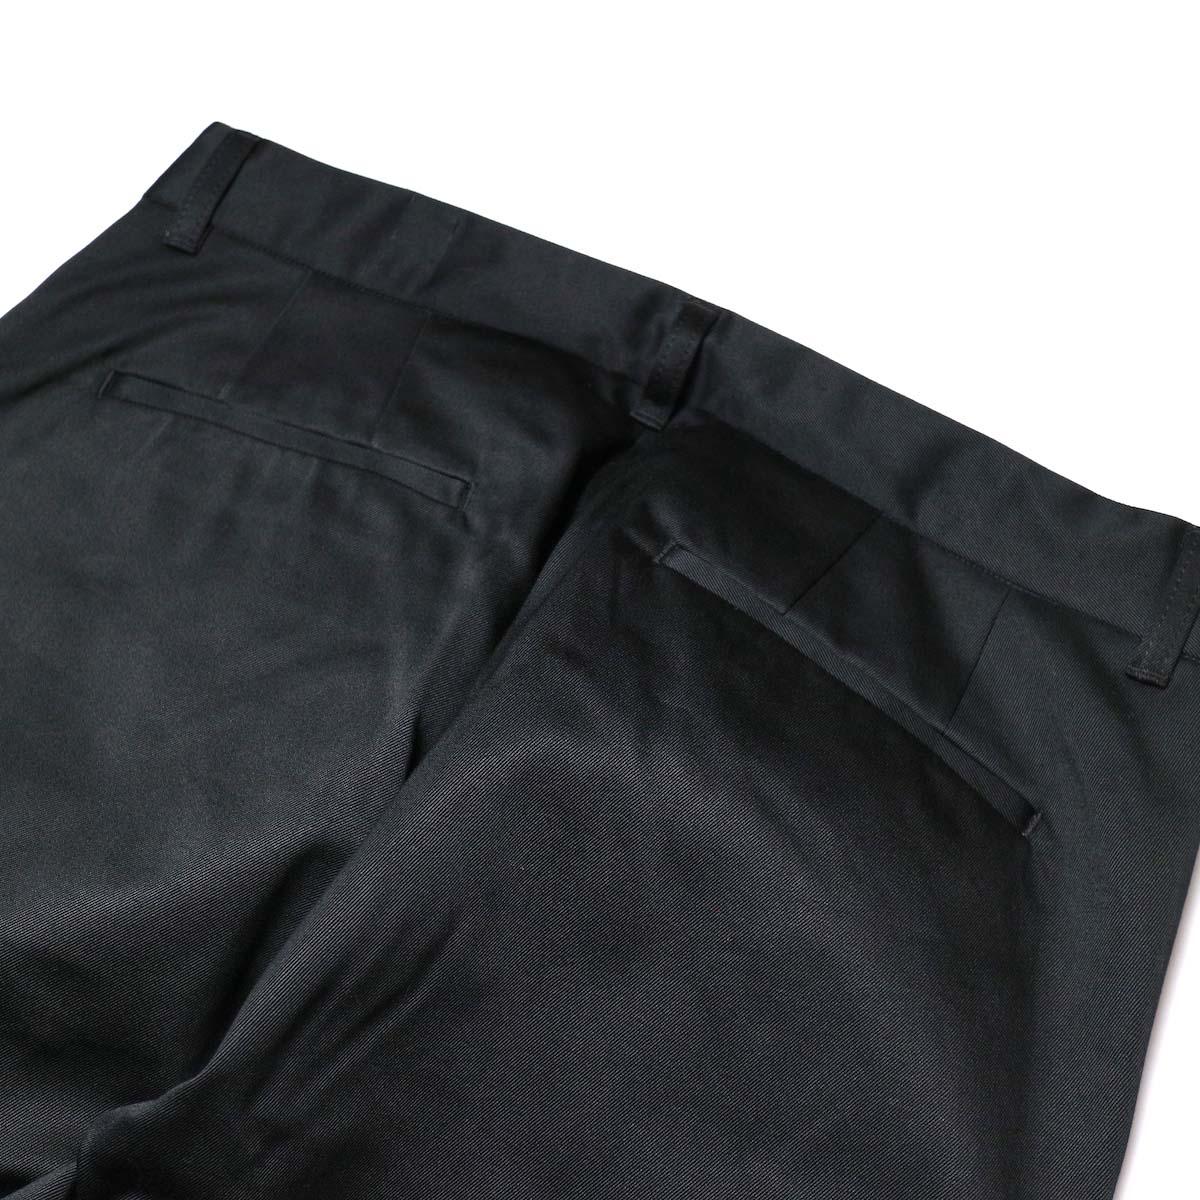 FUTURE PRIMITIVE / FP FZ FLIGHT CHINO PANTS (Black)ヒップポケット